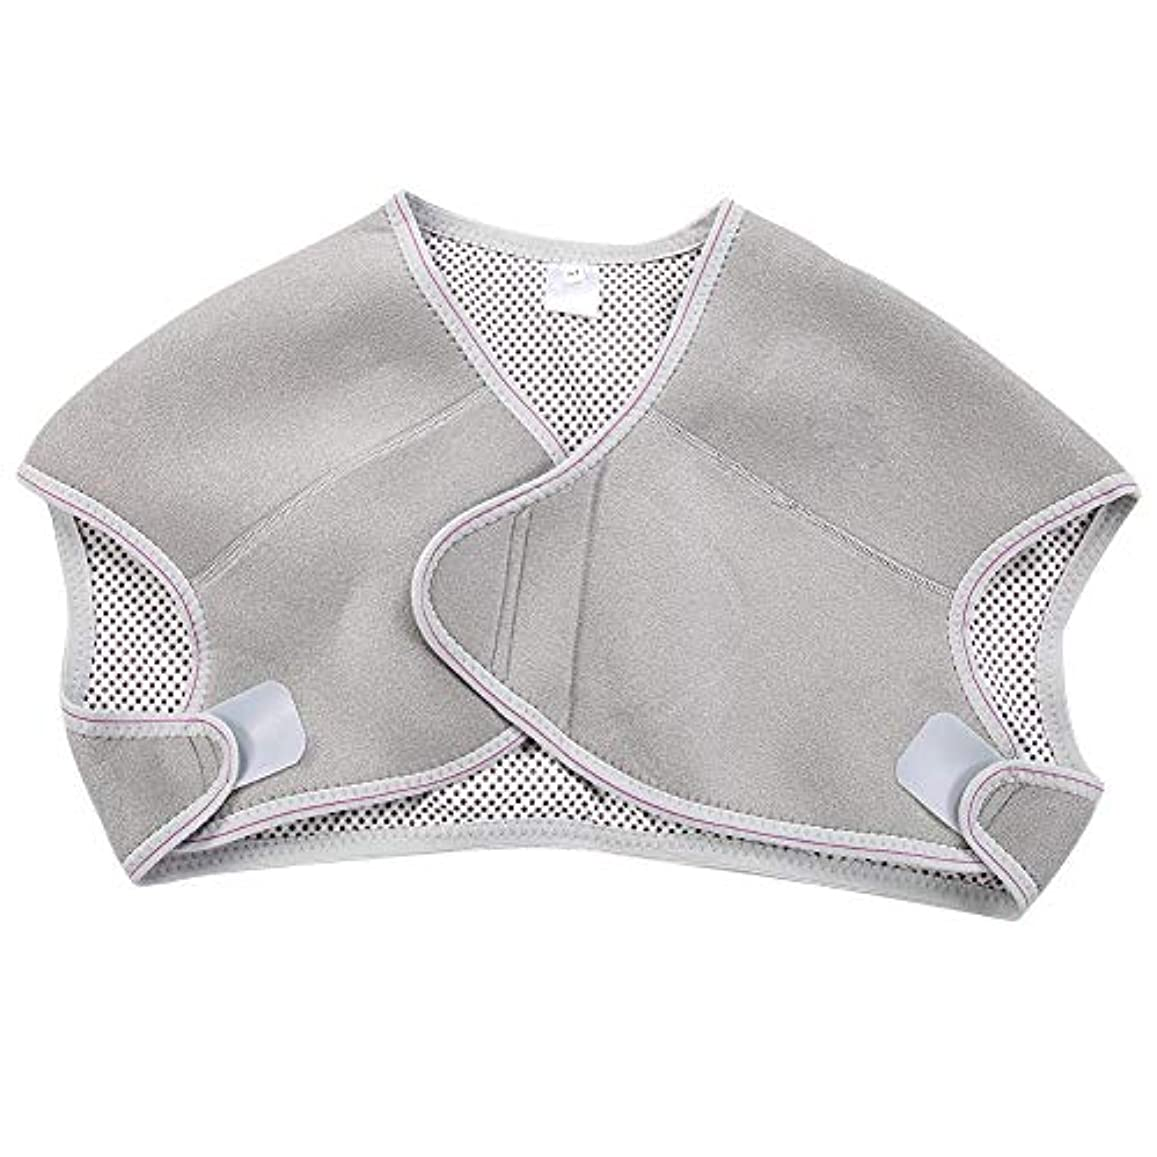 TOPINCN 肩パッド 発熱療法磁気ショルダーパッド 肩 温め ホット 血行促進 ホット 痛み解消 着脱 簡単 男女兼用 調節可能 自己発熱(M)